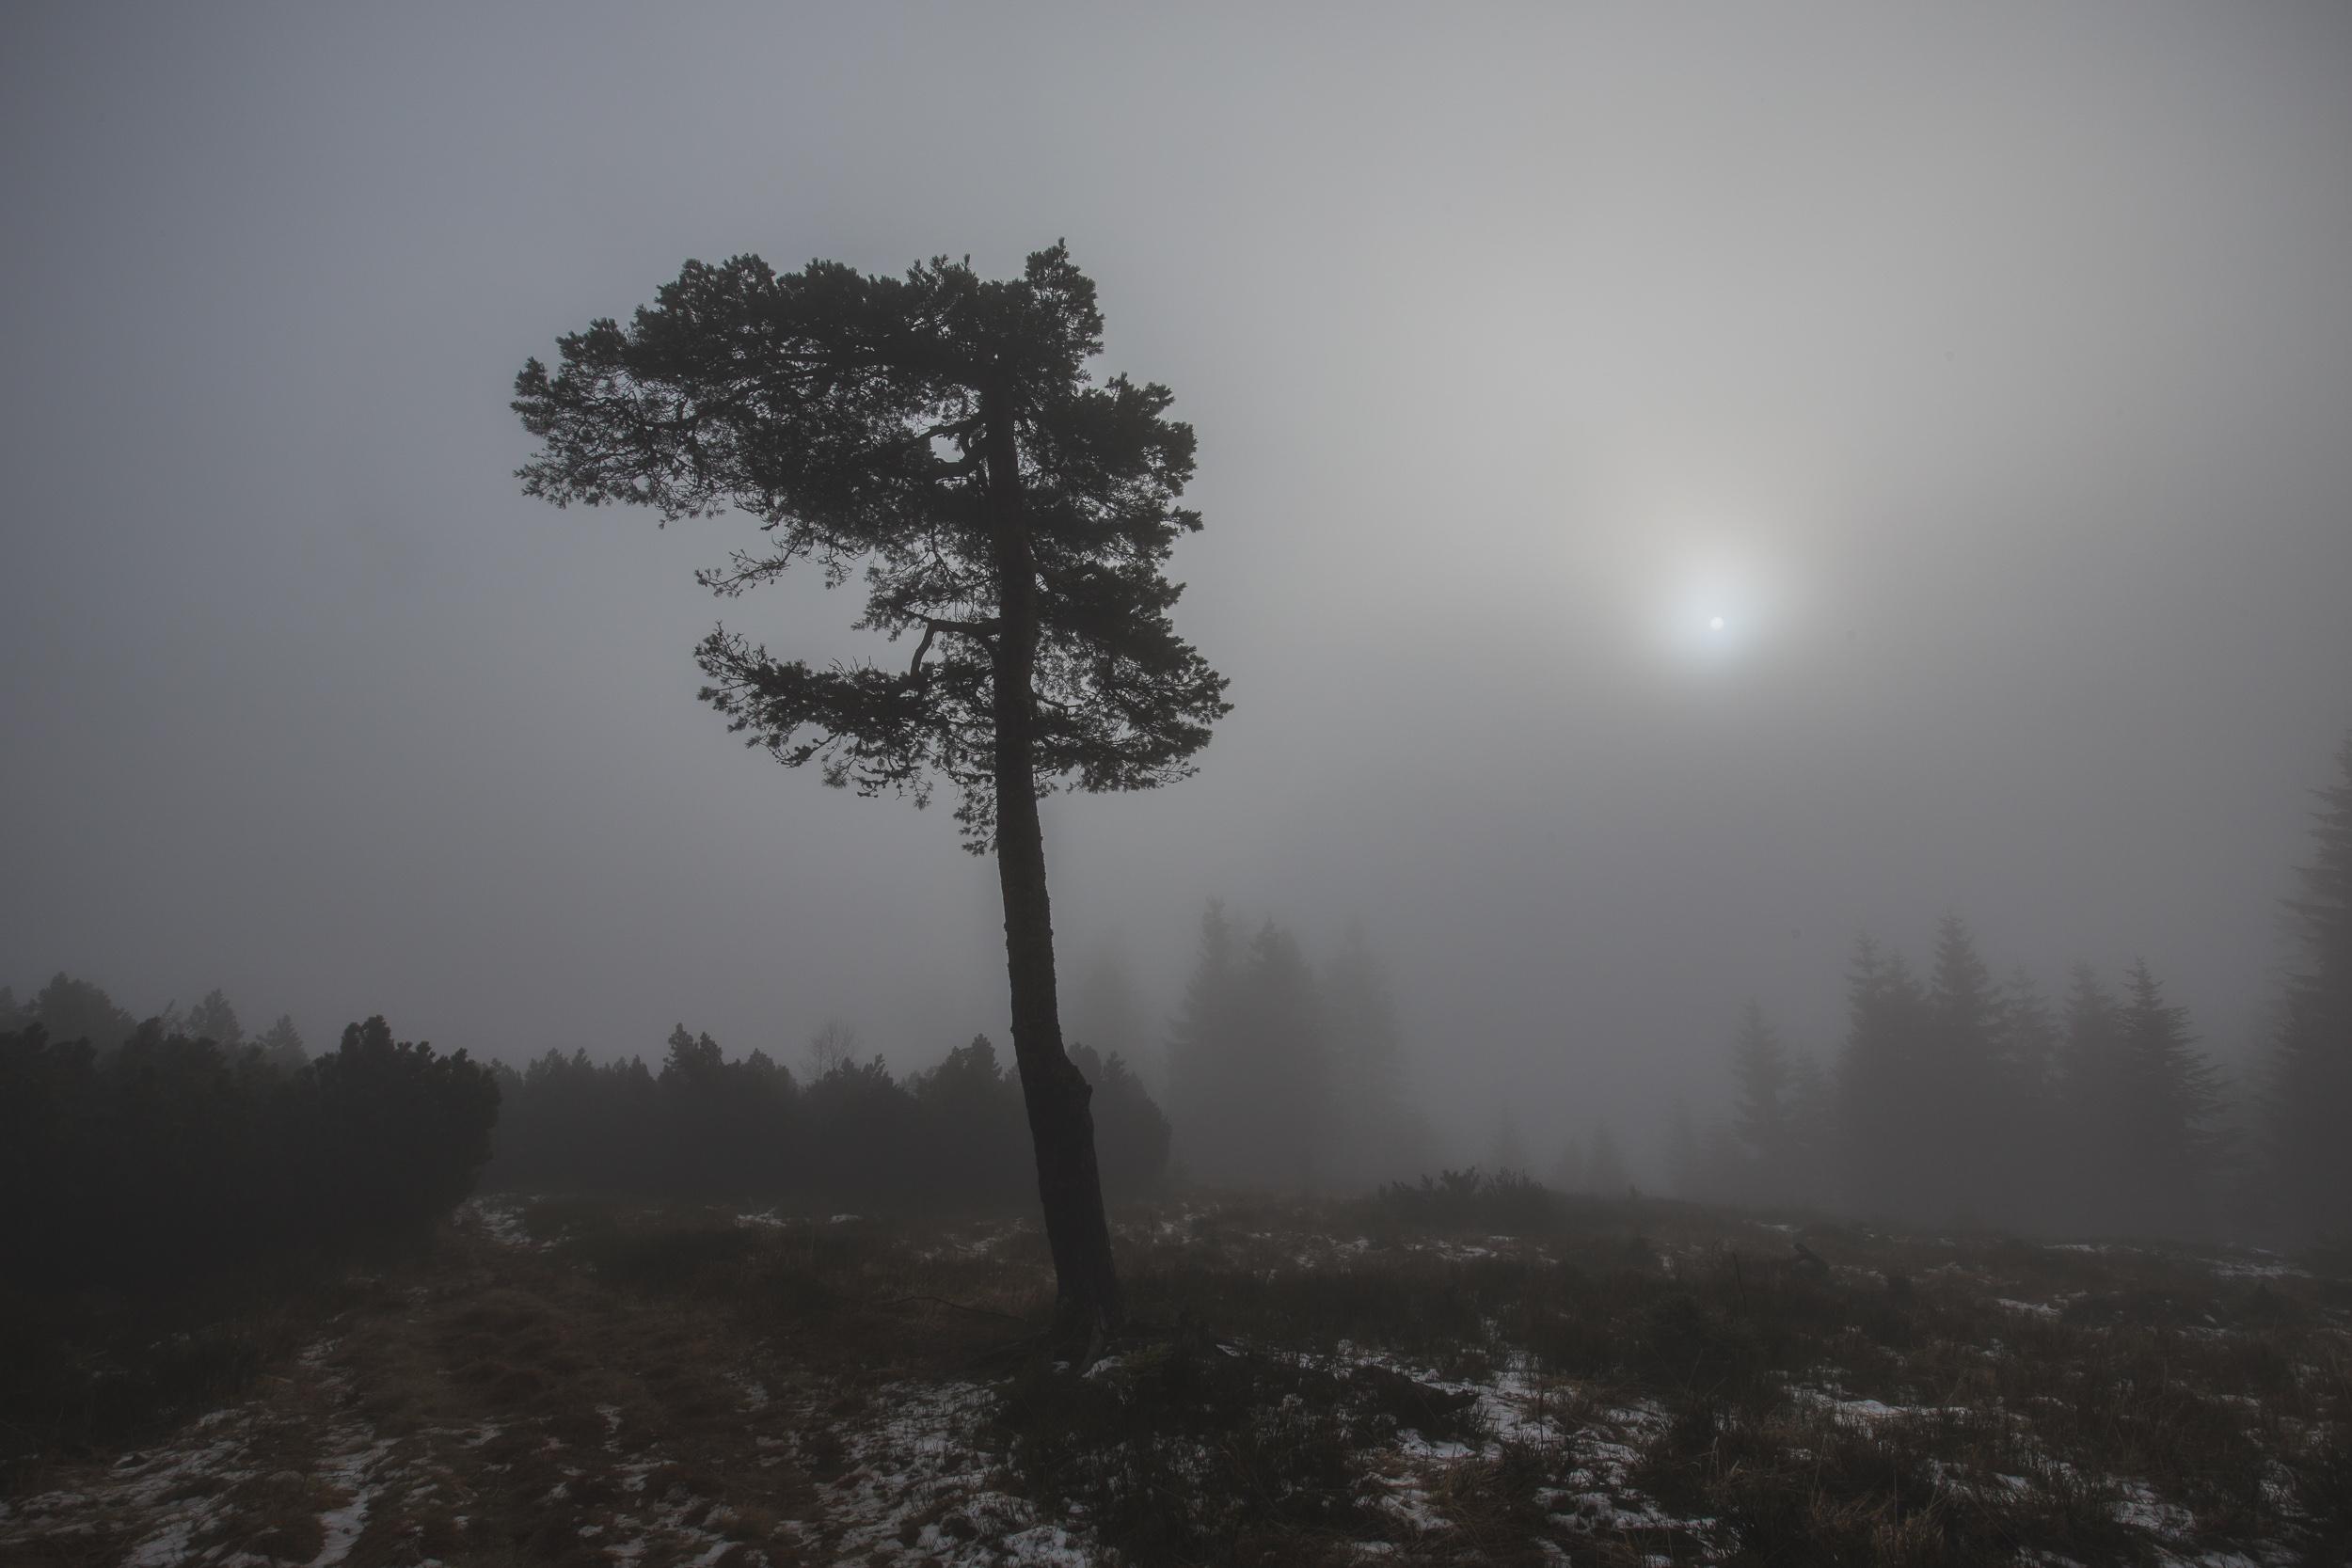 140112_winter_galerie_01.jpg